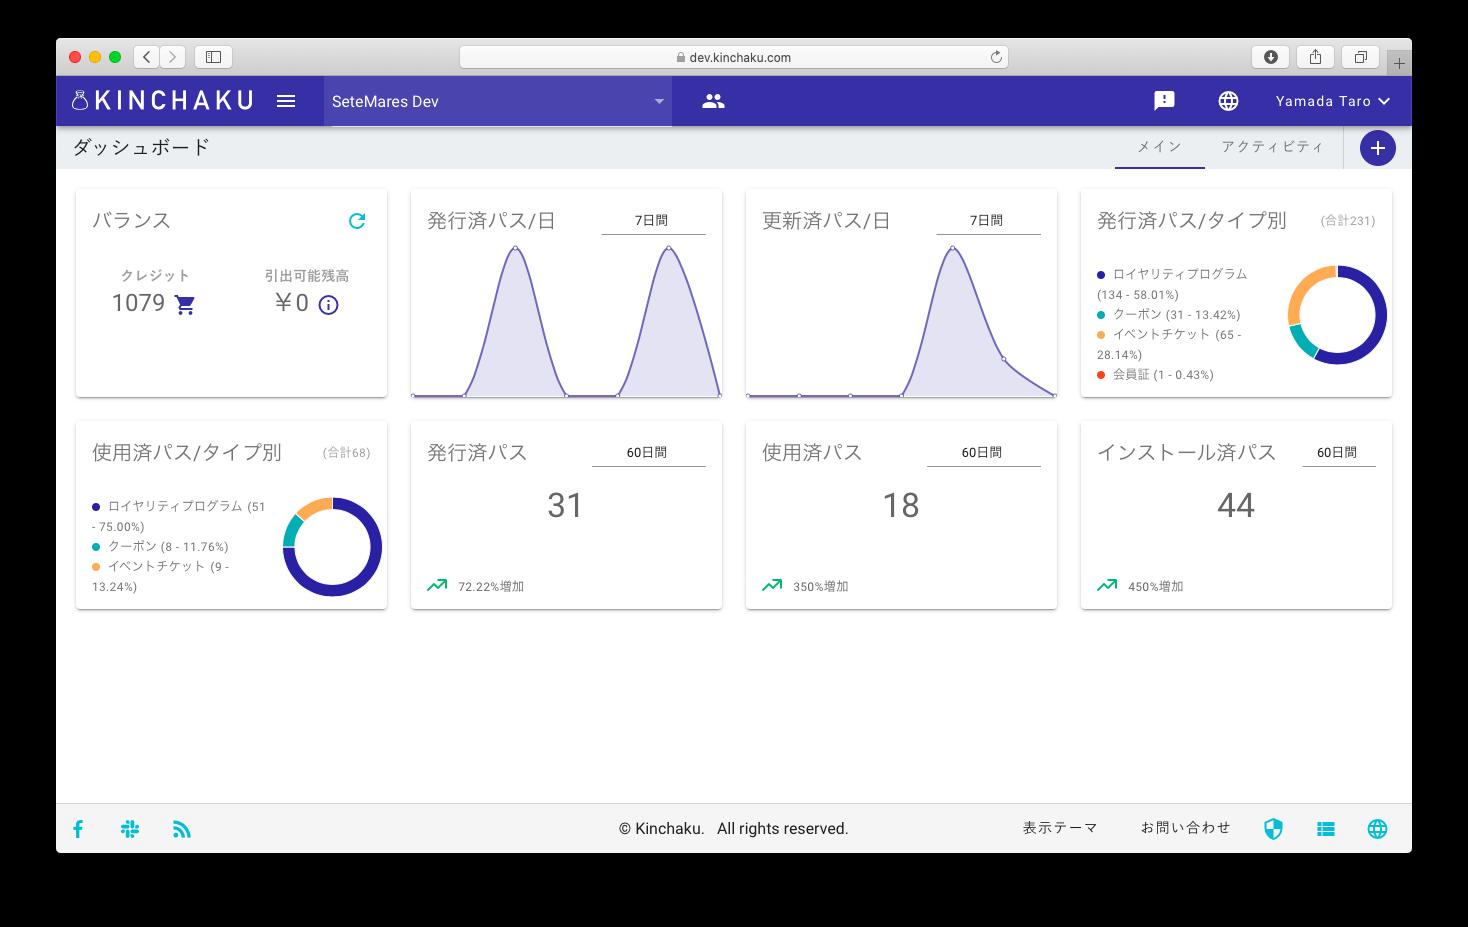 kinchakuのデータ解析部分の画面キャプチャ